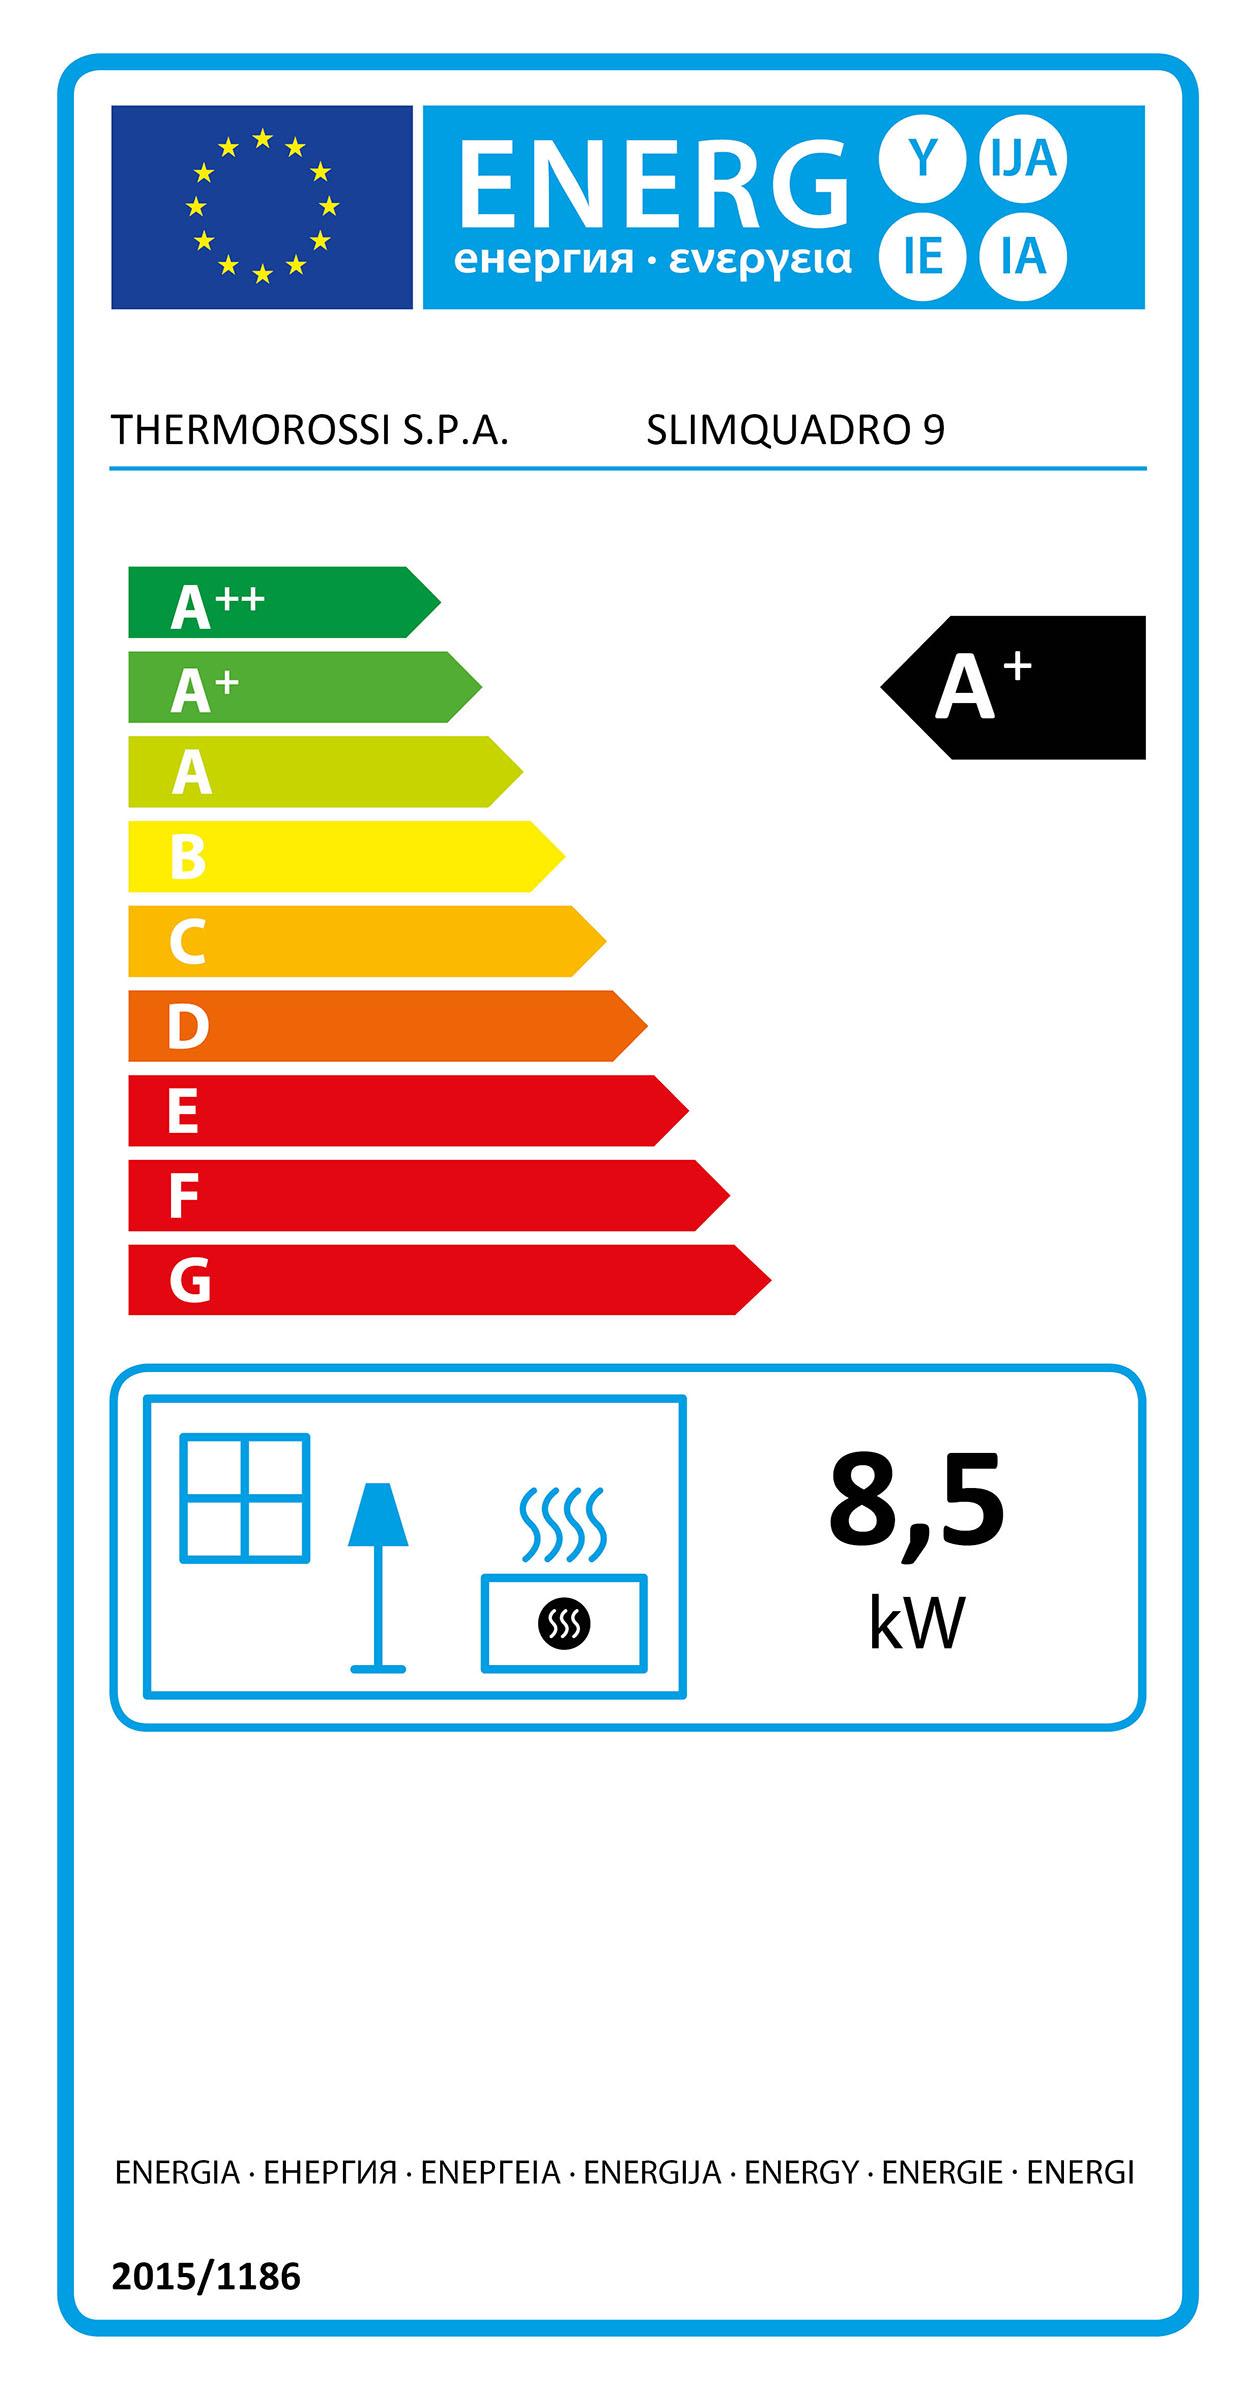 Pelletkachel Thermorossi - slimquadro-9 - energielabel